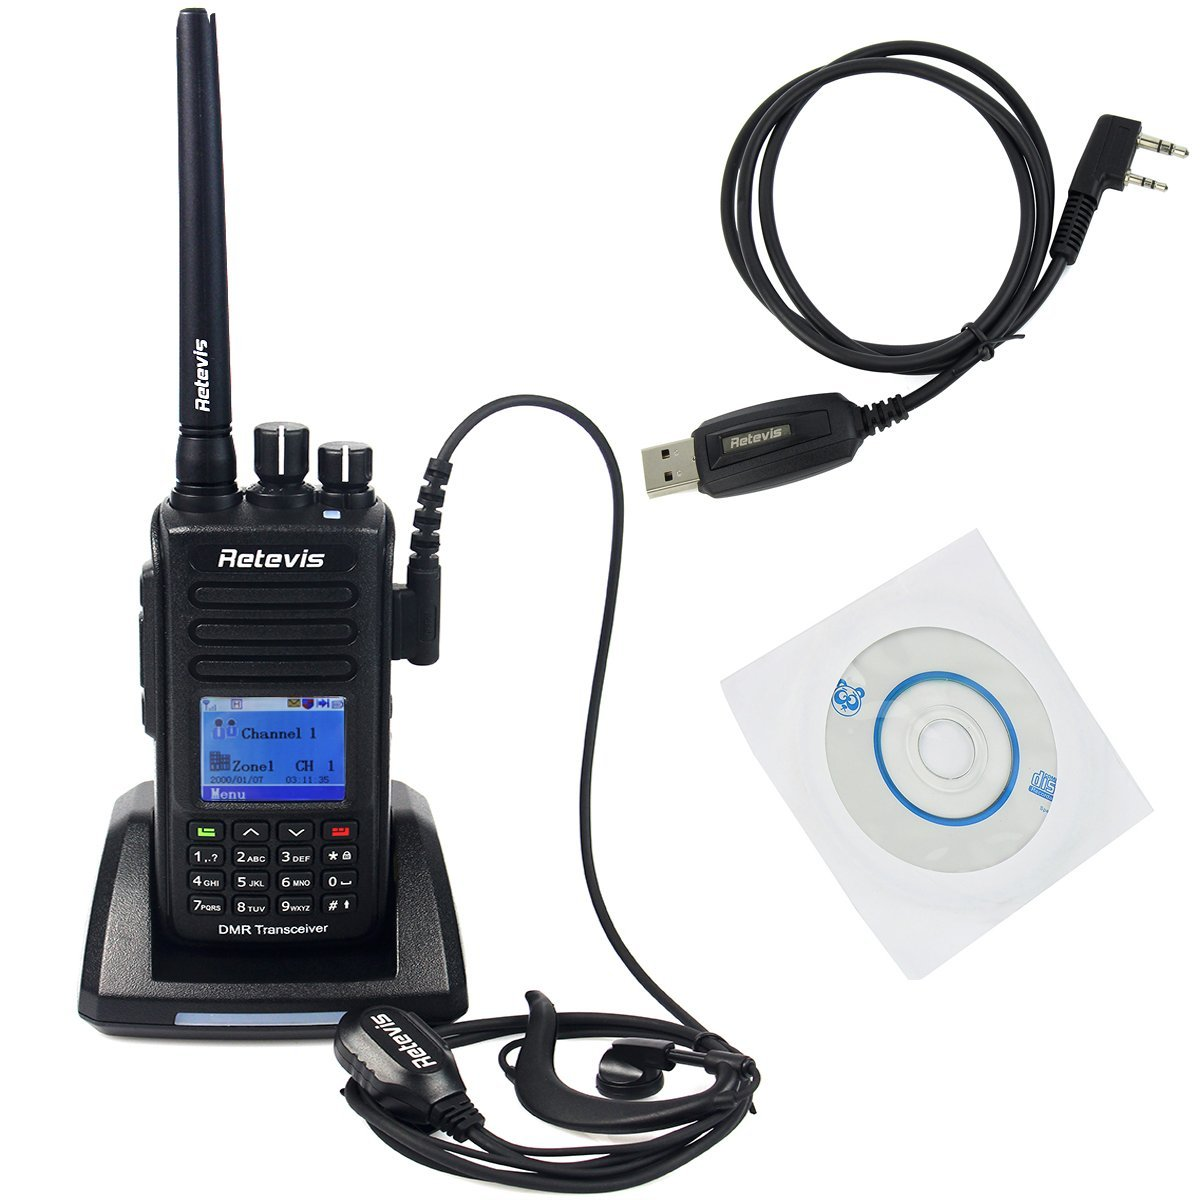 Retevis RT8 IP67 Waterproof Dustproof DMR Digital Two Way Radio 5W VHF 136-174Mhz 1000 Channel and Programming Cable (1 Pack)